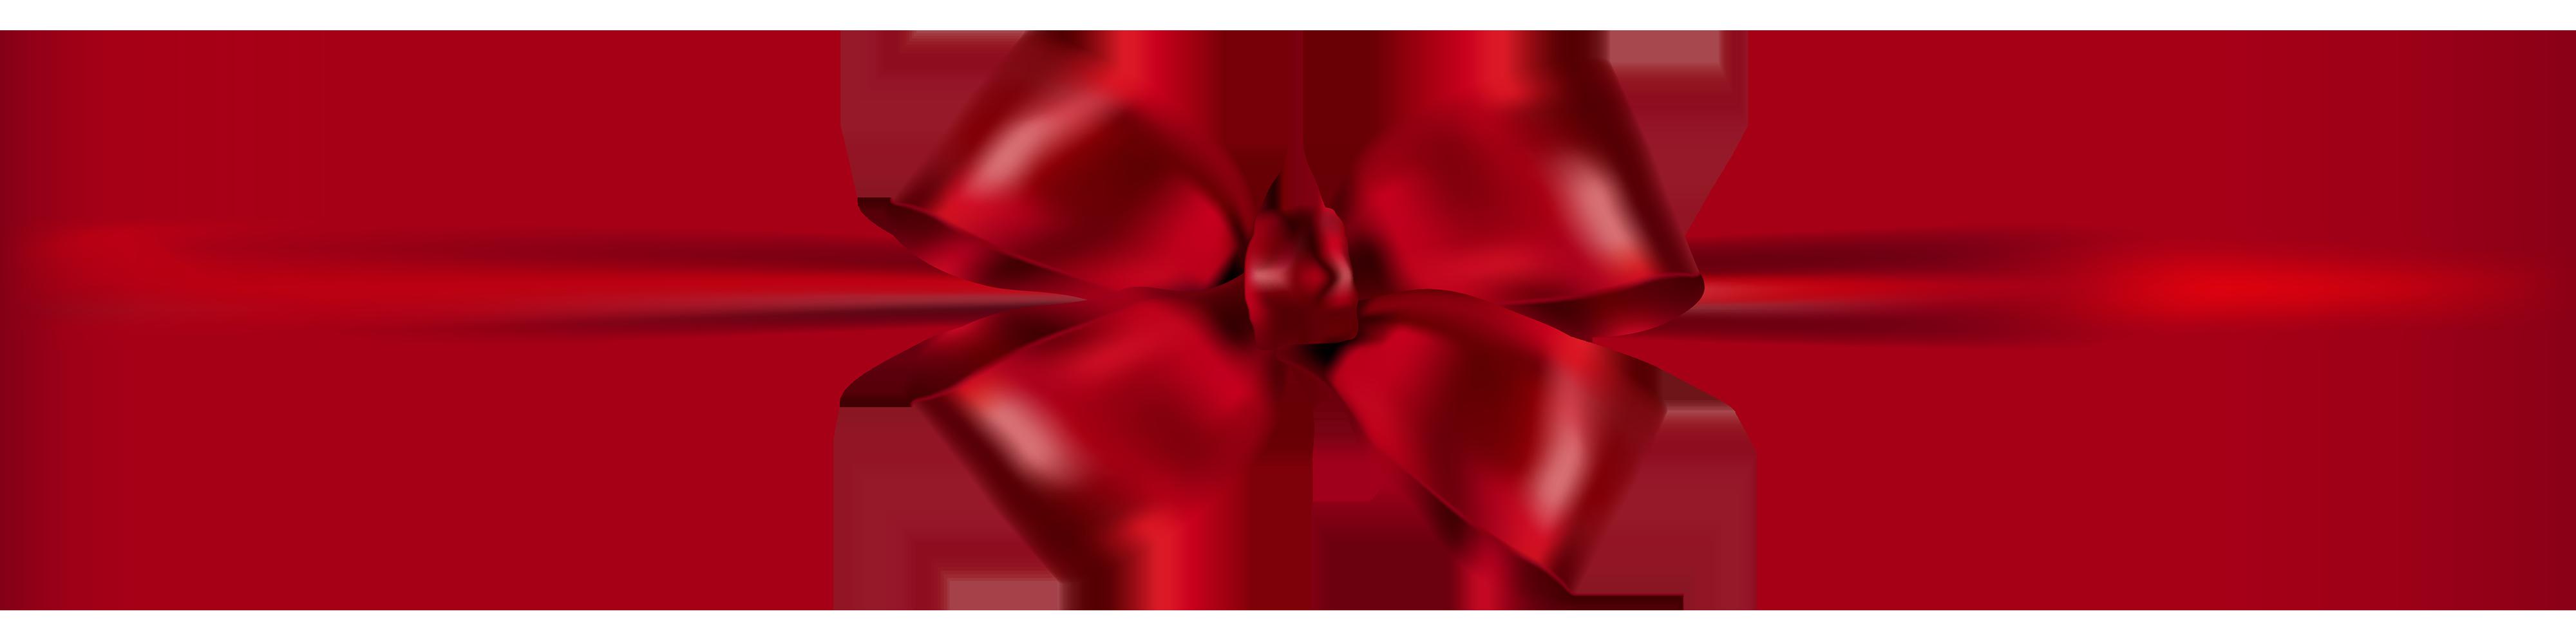 Dark red ribbon png. Faces clipart beautiful